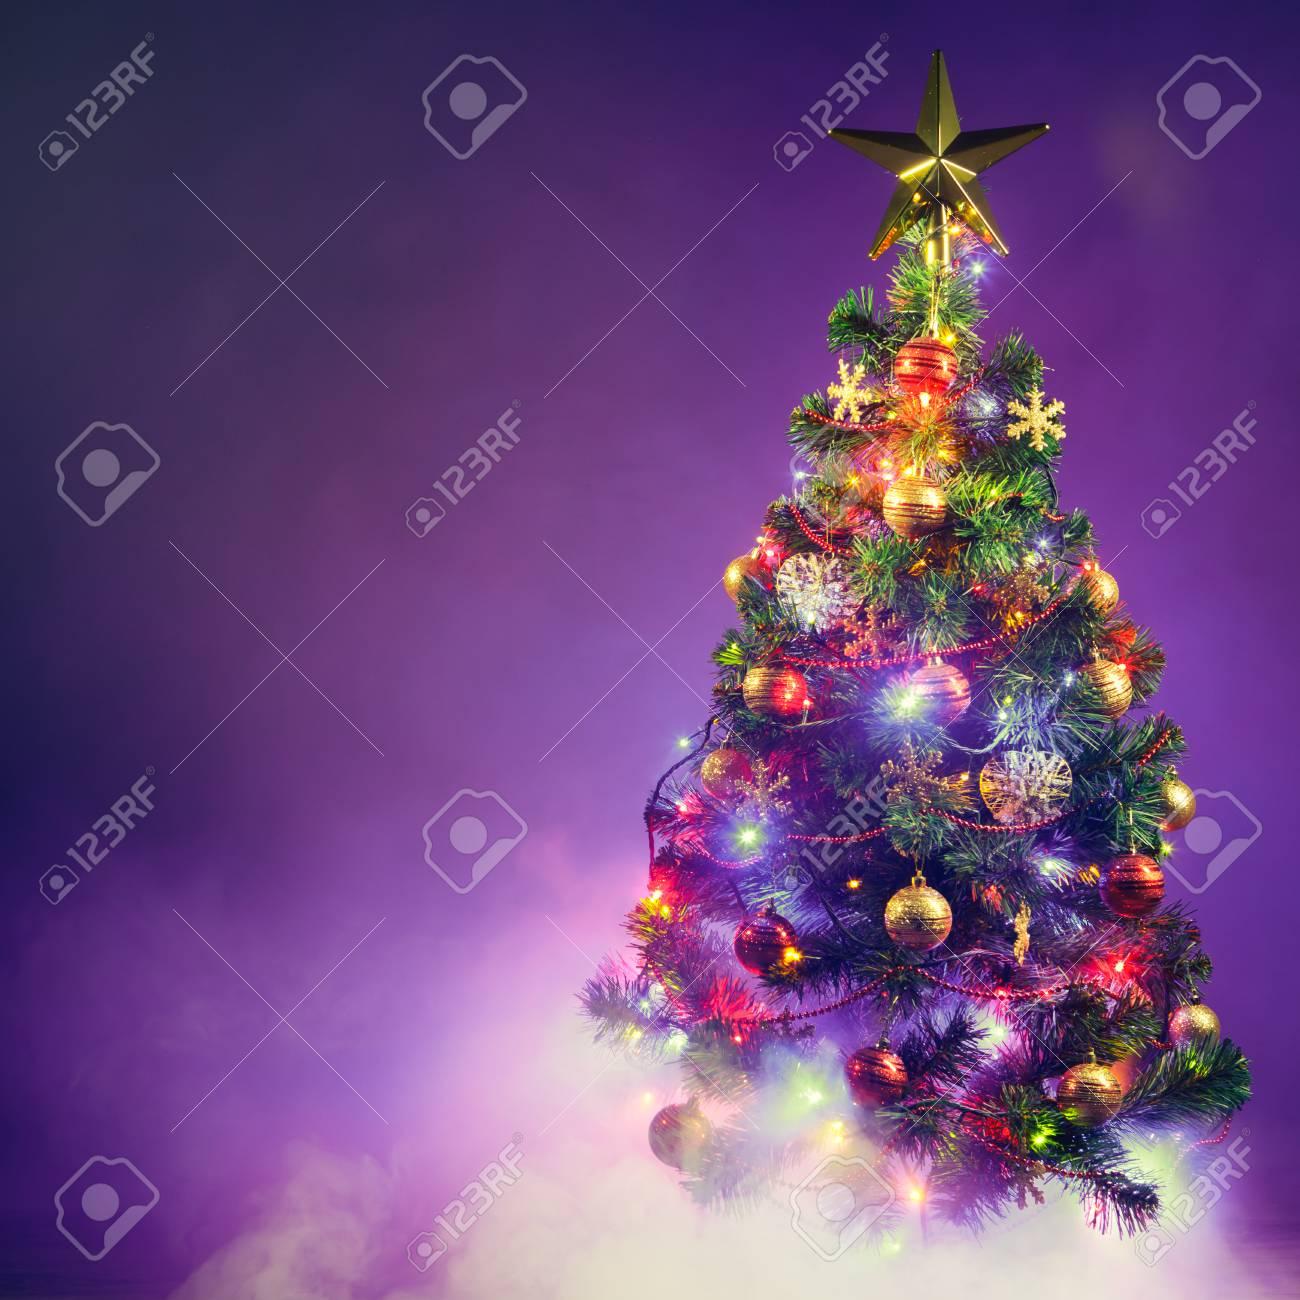 Purple Christmas Tree Lights.Christmas Tree With Festive Lights Purple Background With Smoke